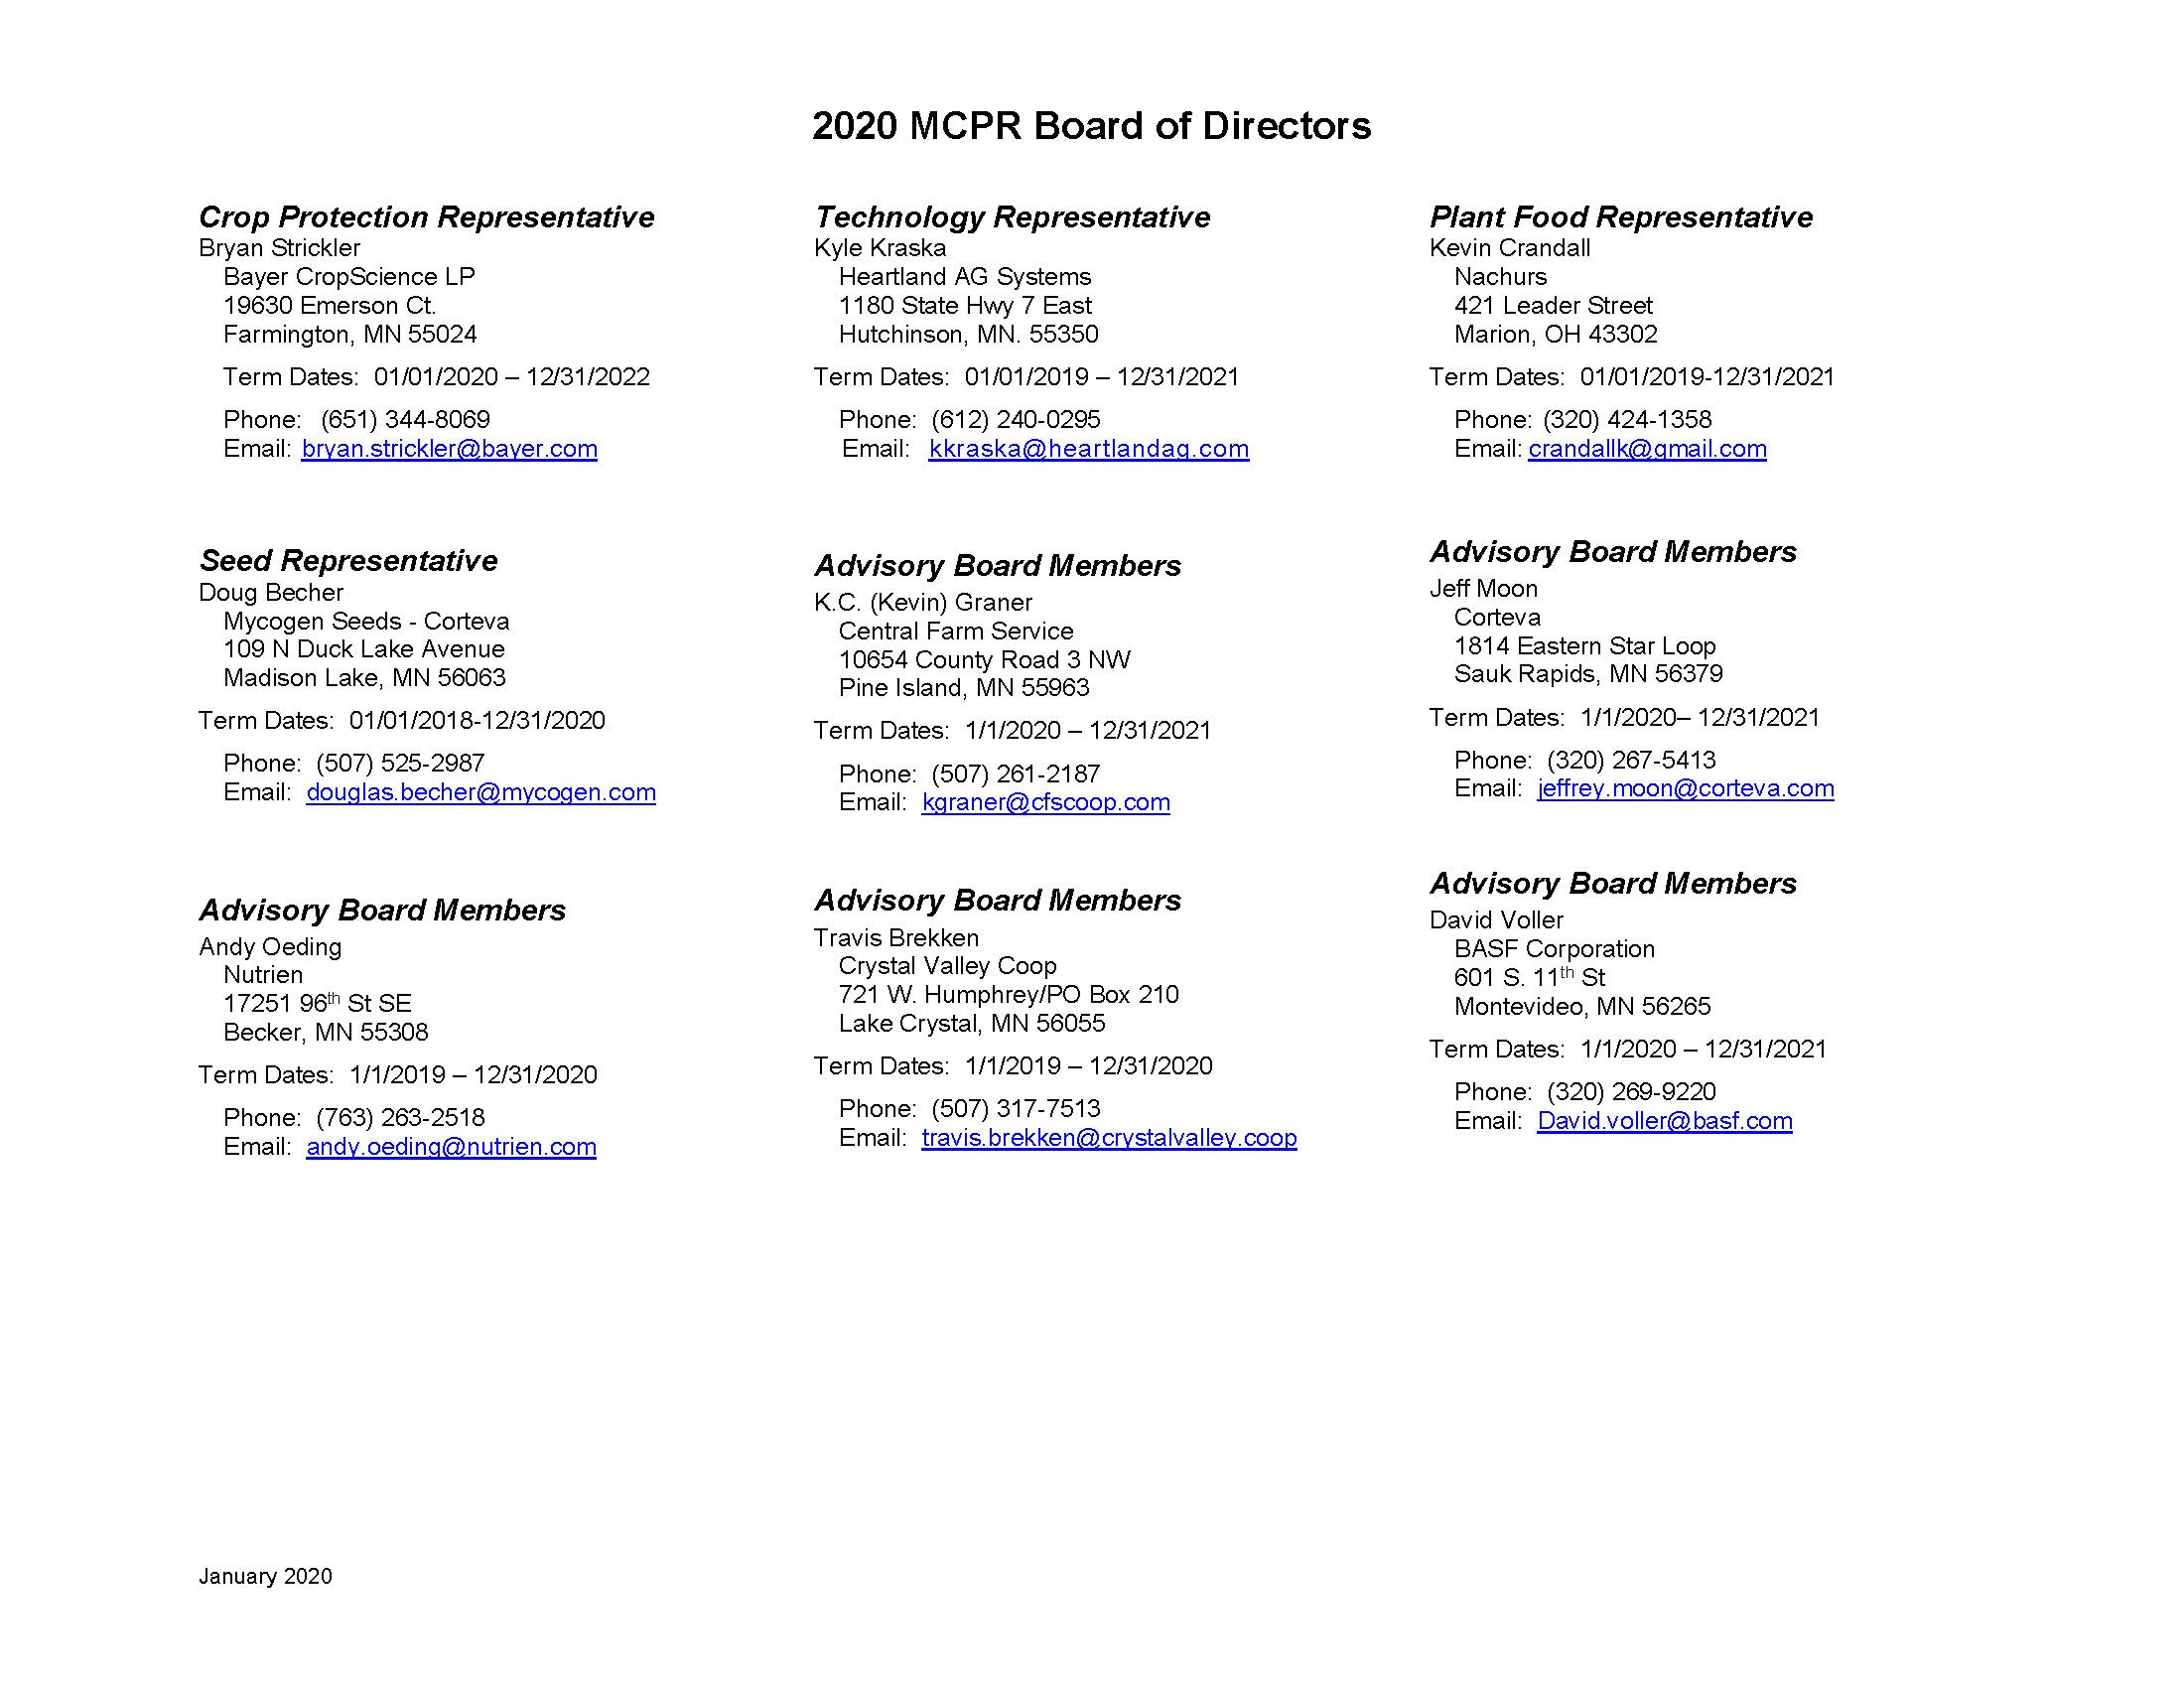 2020 MCPR Board of Directors_Page_2